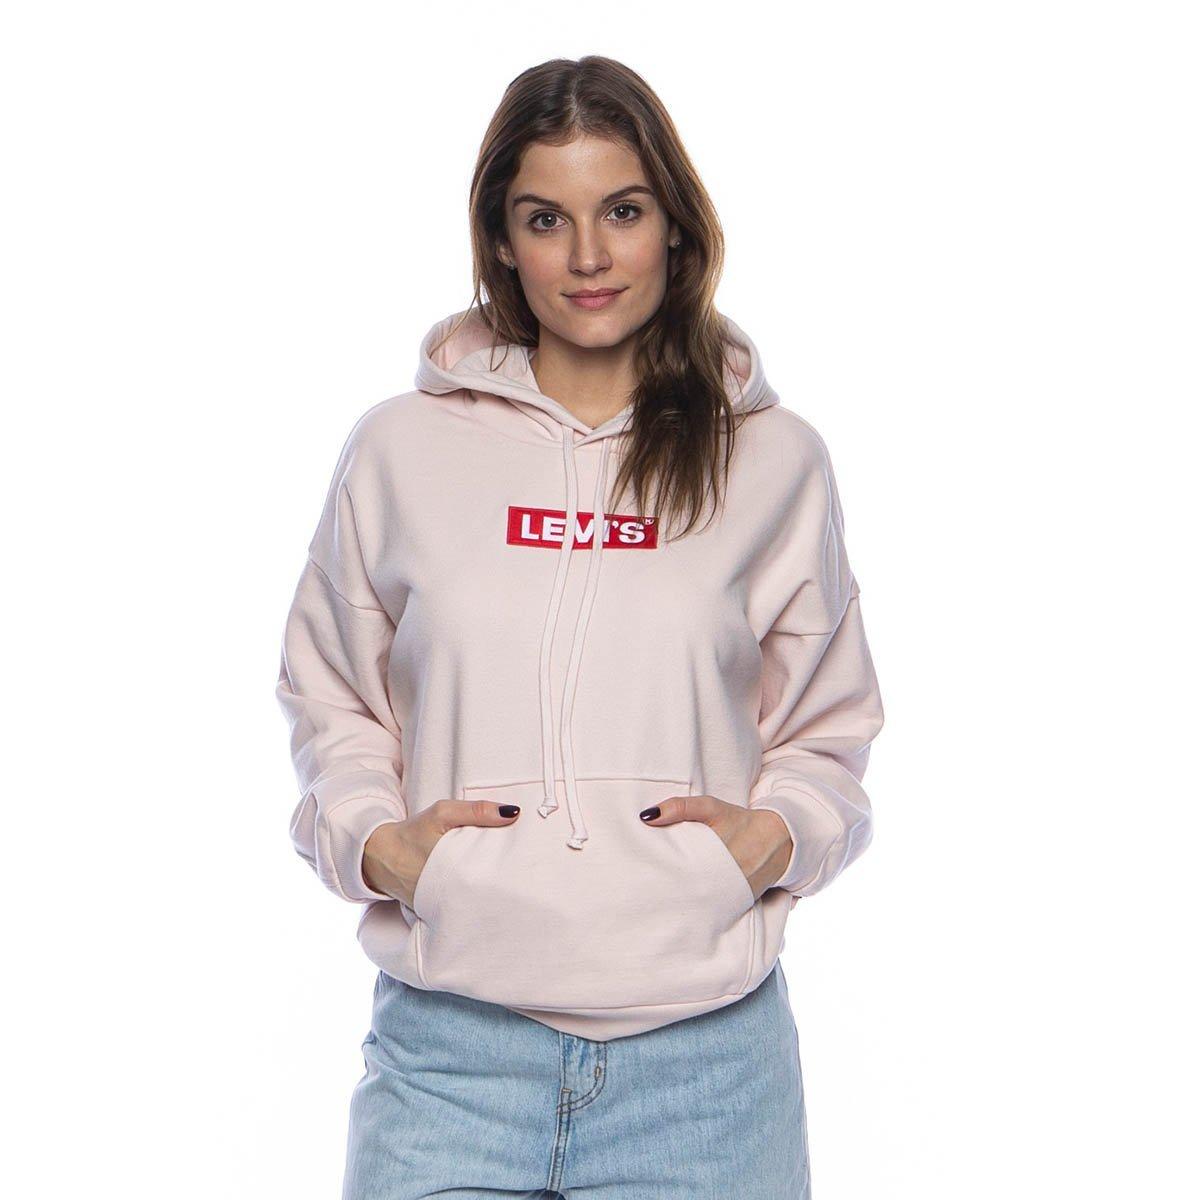 Sweatshirt WMNS Levi's Graphic 2020 Hoodie light pink